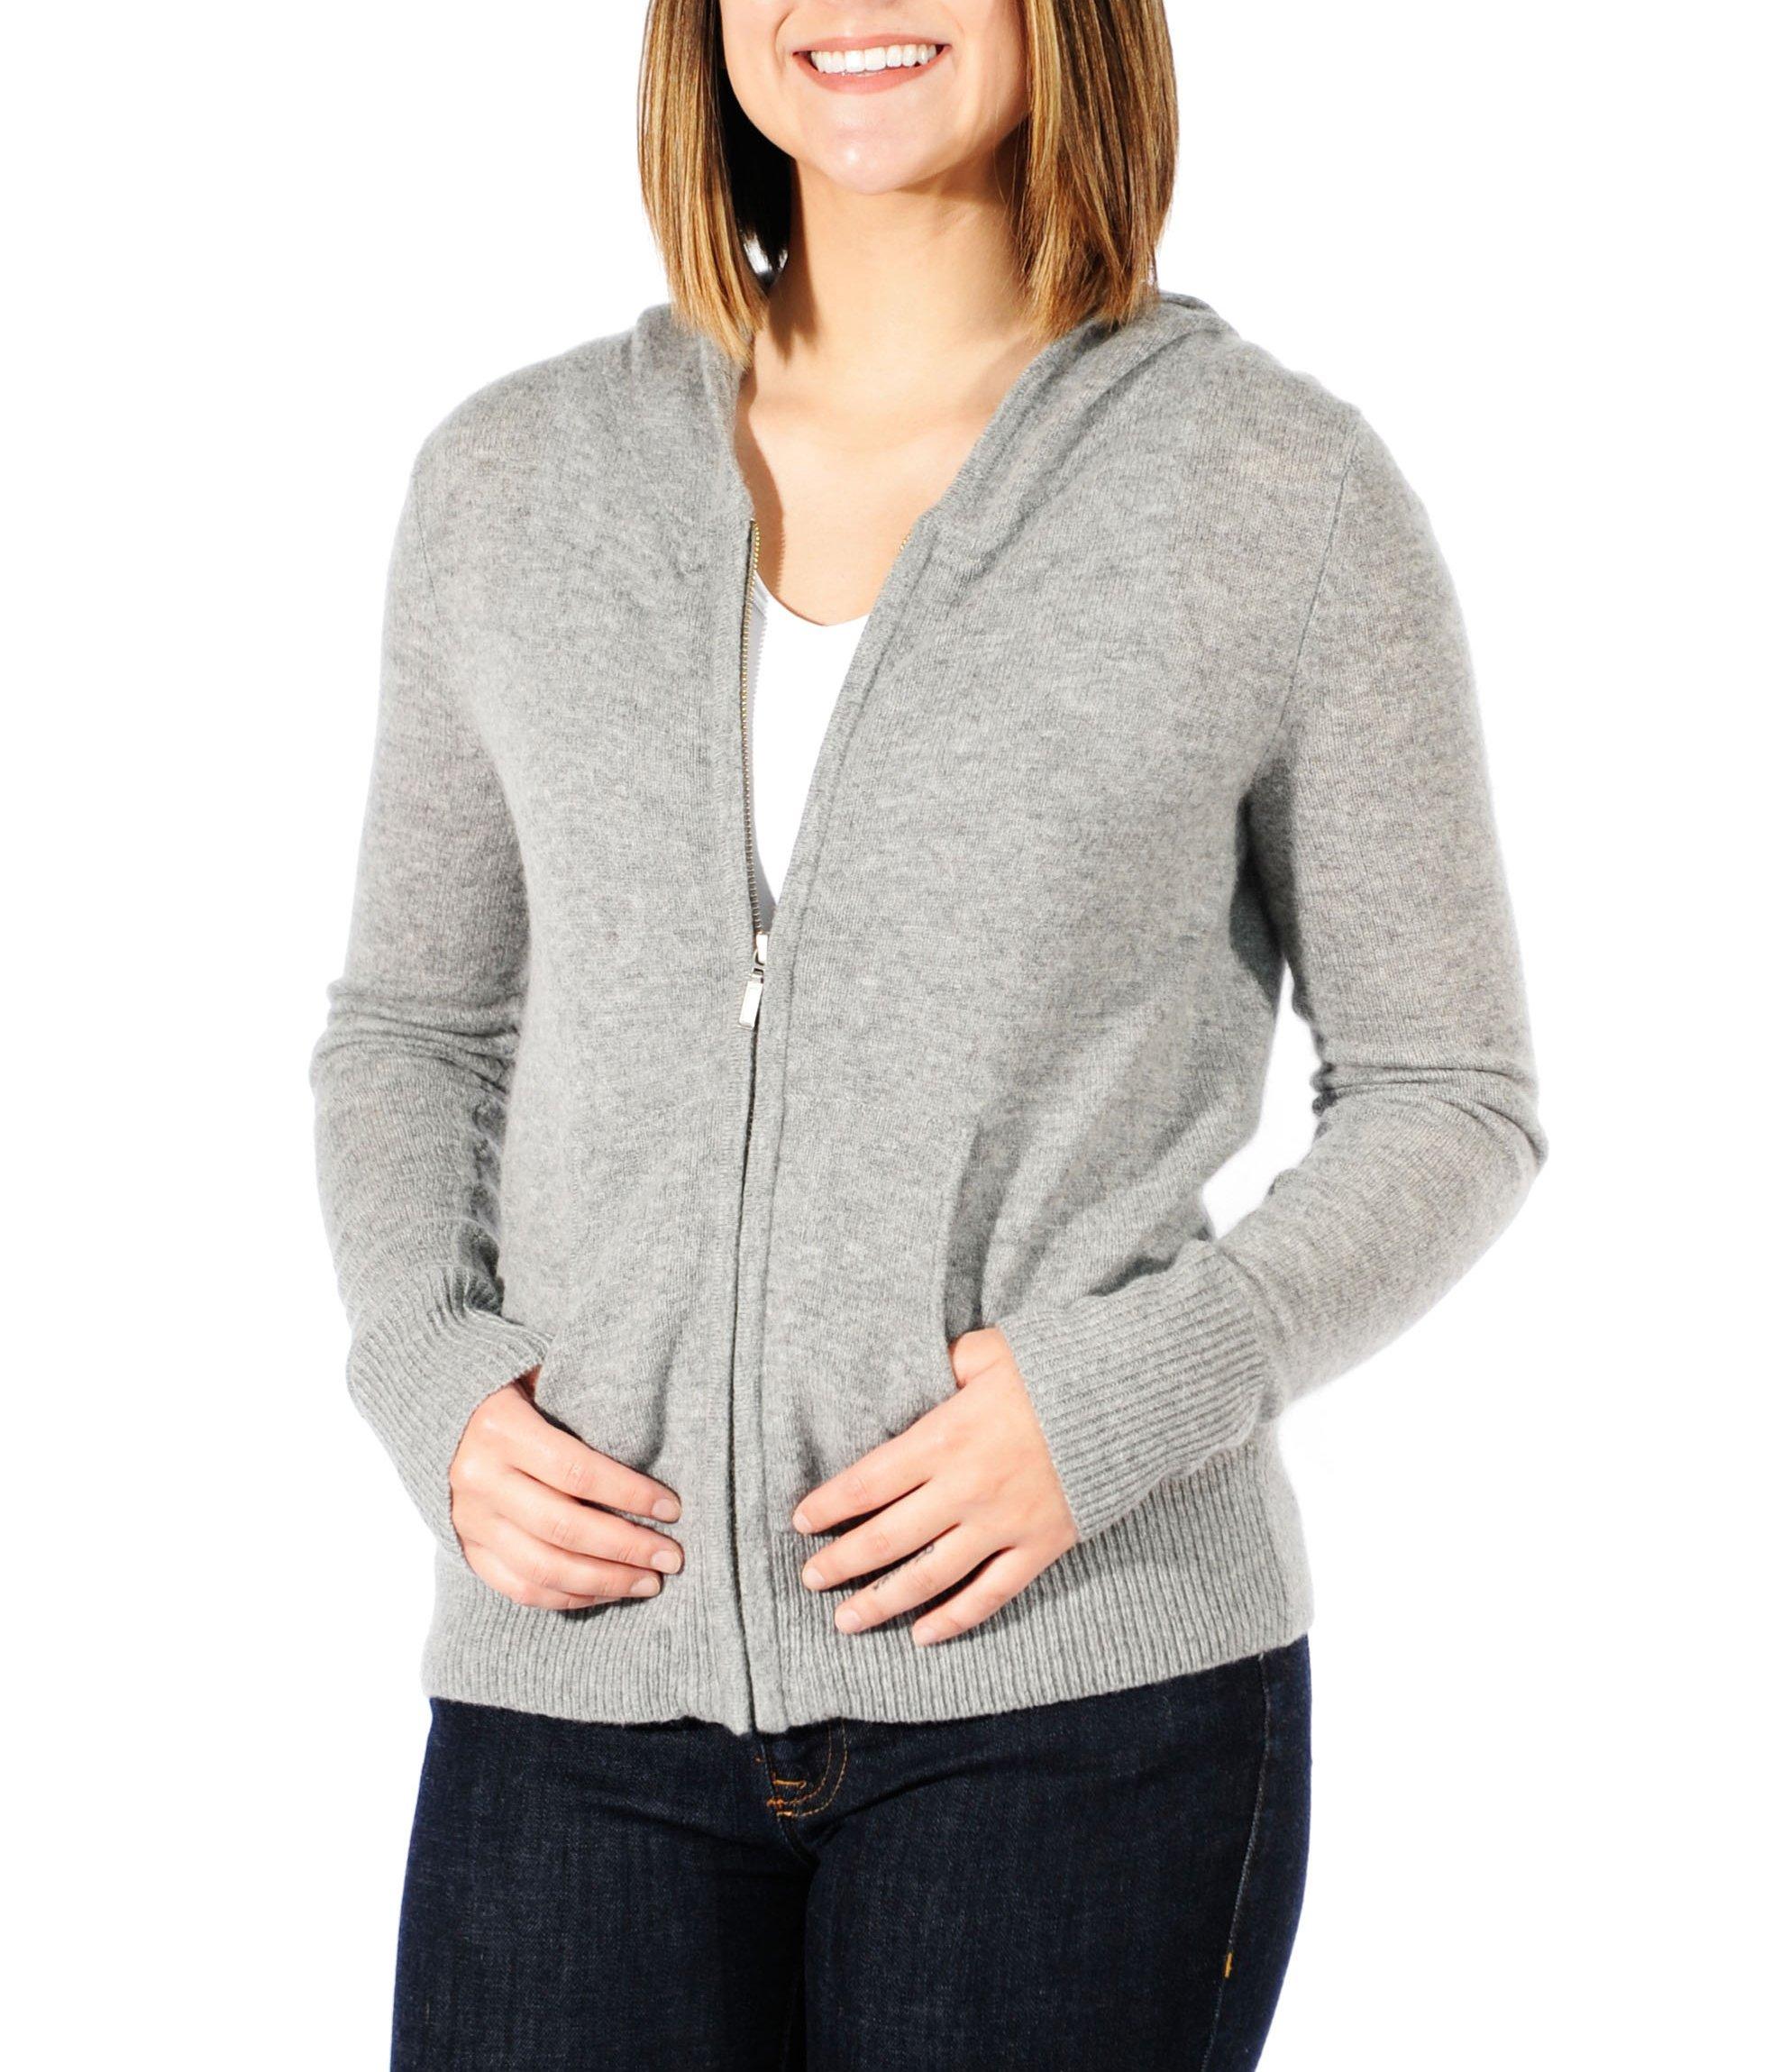 Gigi Reaume 100% Cashmere Zip Front Cardigan Hoodie Sweater (Medium, Grey Heather)